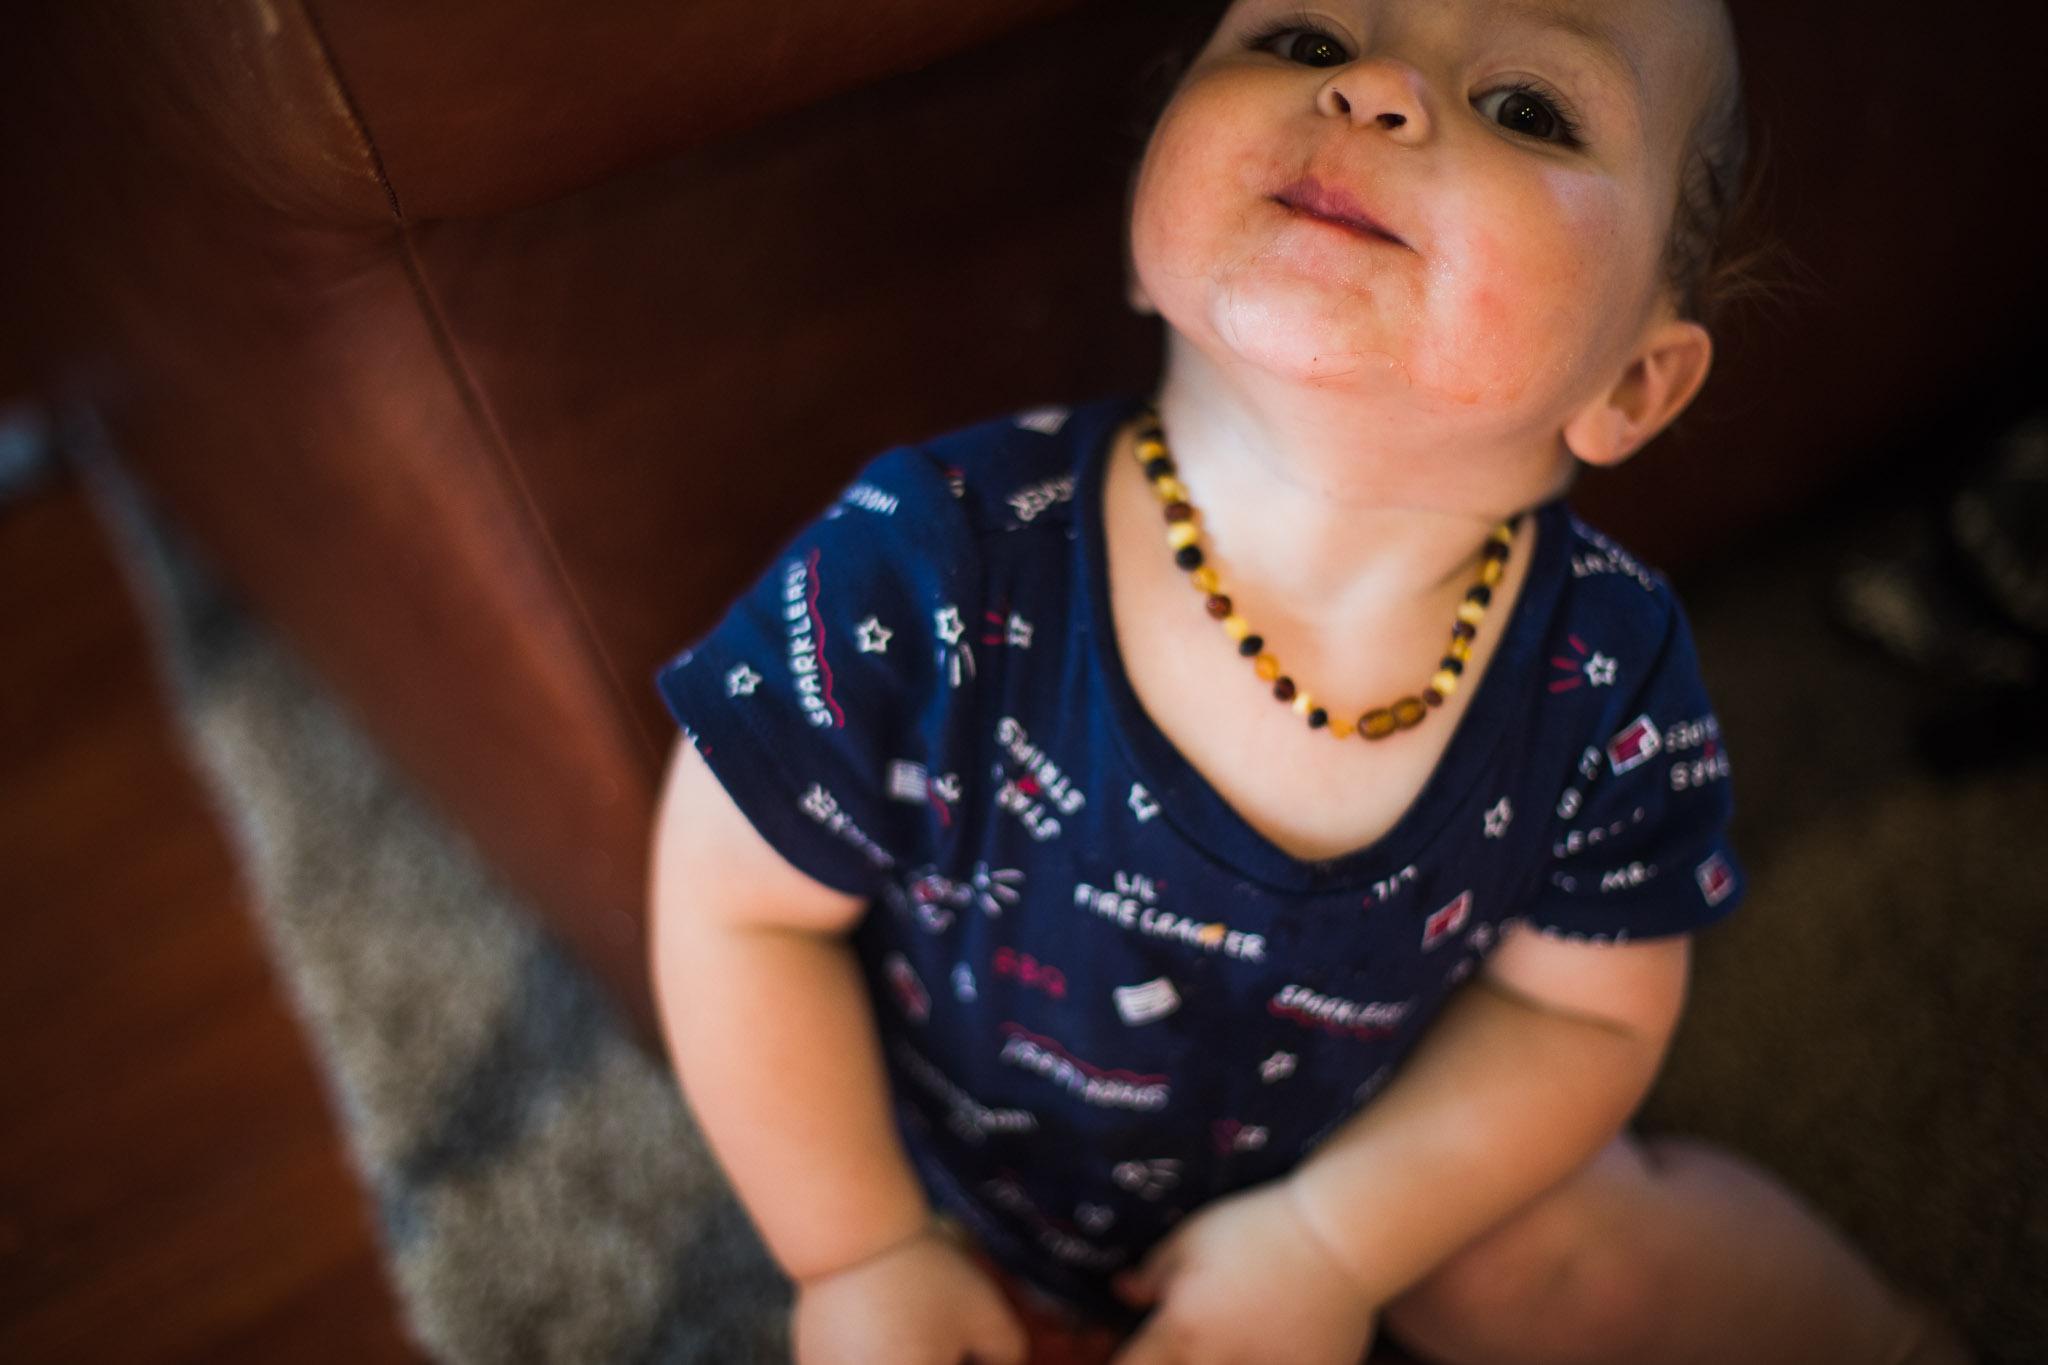 Archer_Inspired_Photography_Watermelon_Baby_Boy_Eating_Lifestyle_Photographer_California-28.jpg